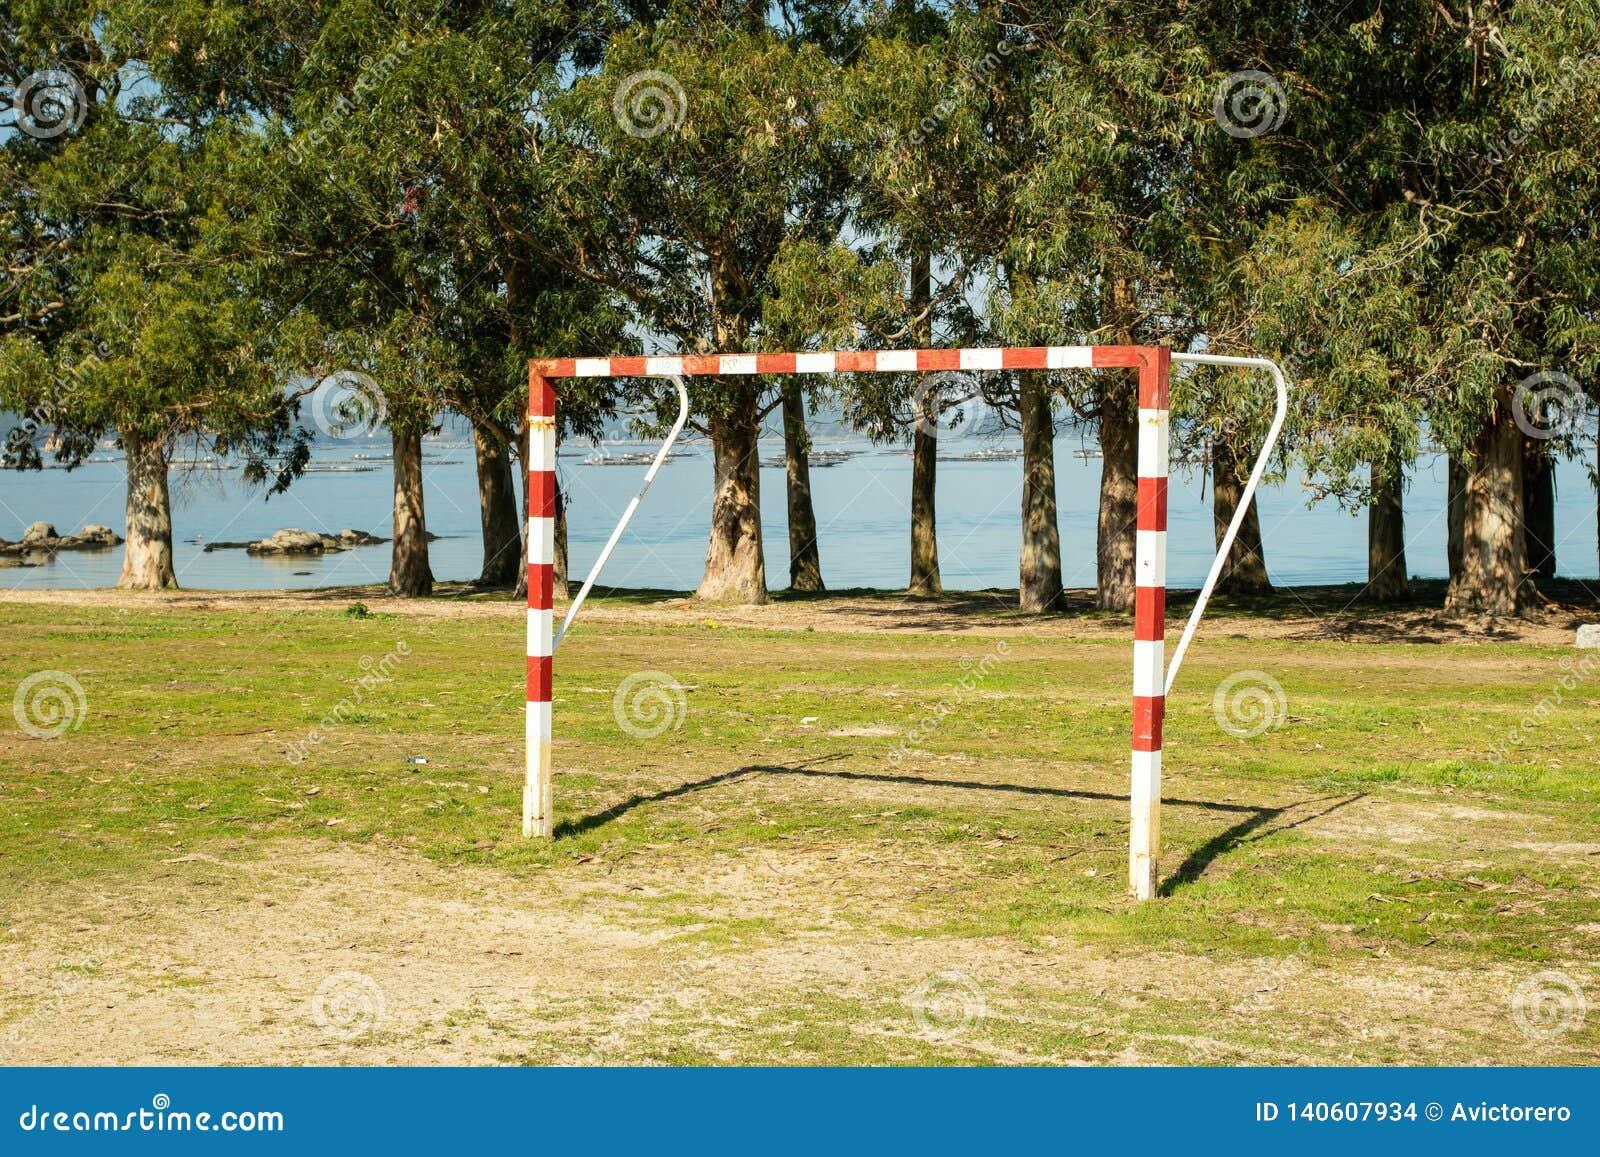 Soccer gate on amateur soccer court